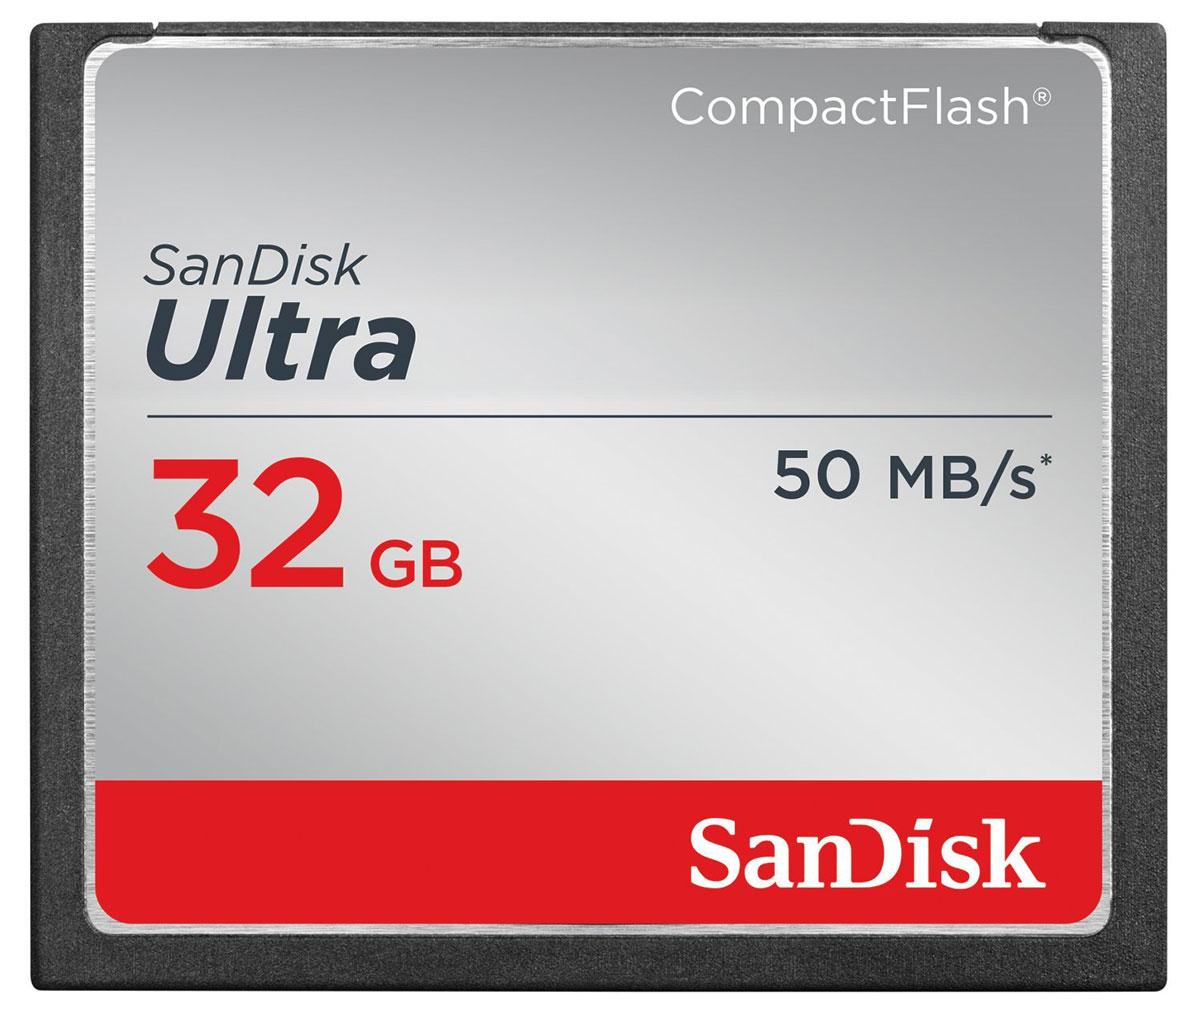 SanDisk Ultra CompactFlash 32GB карта памяти - Карты памяти